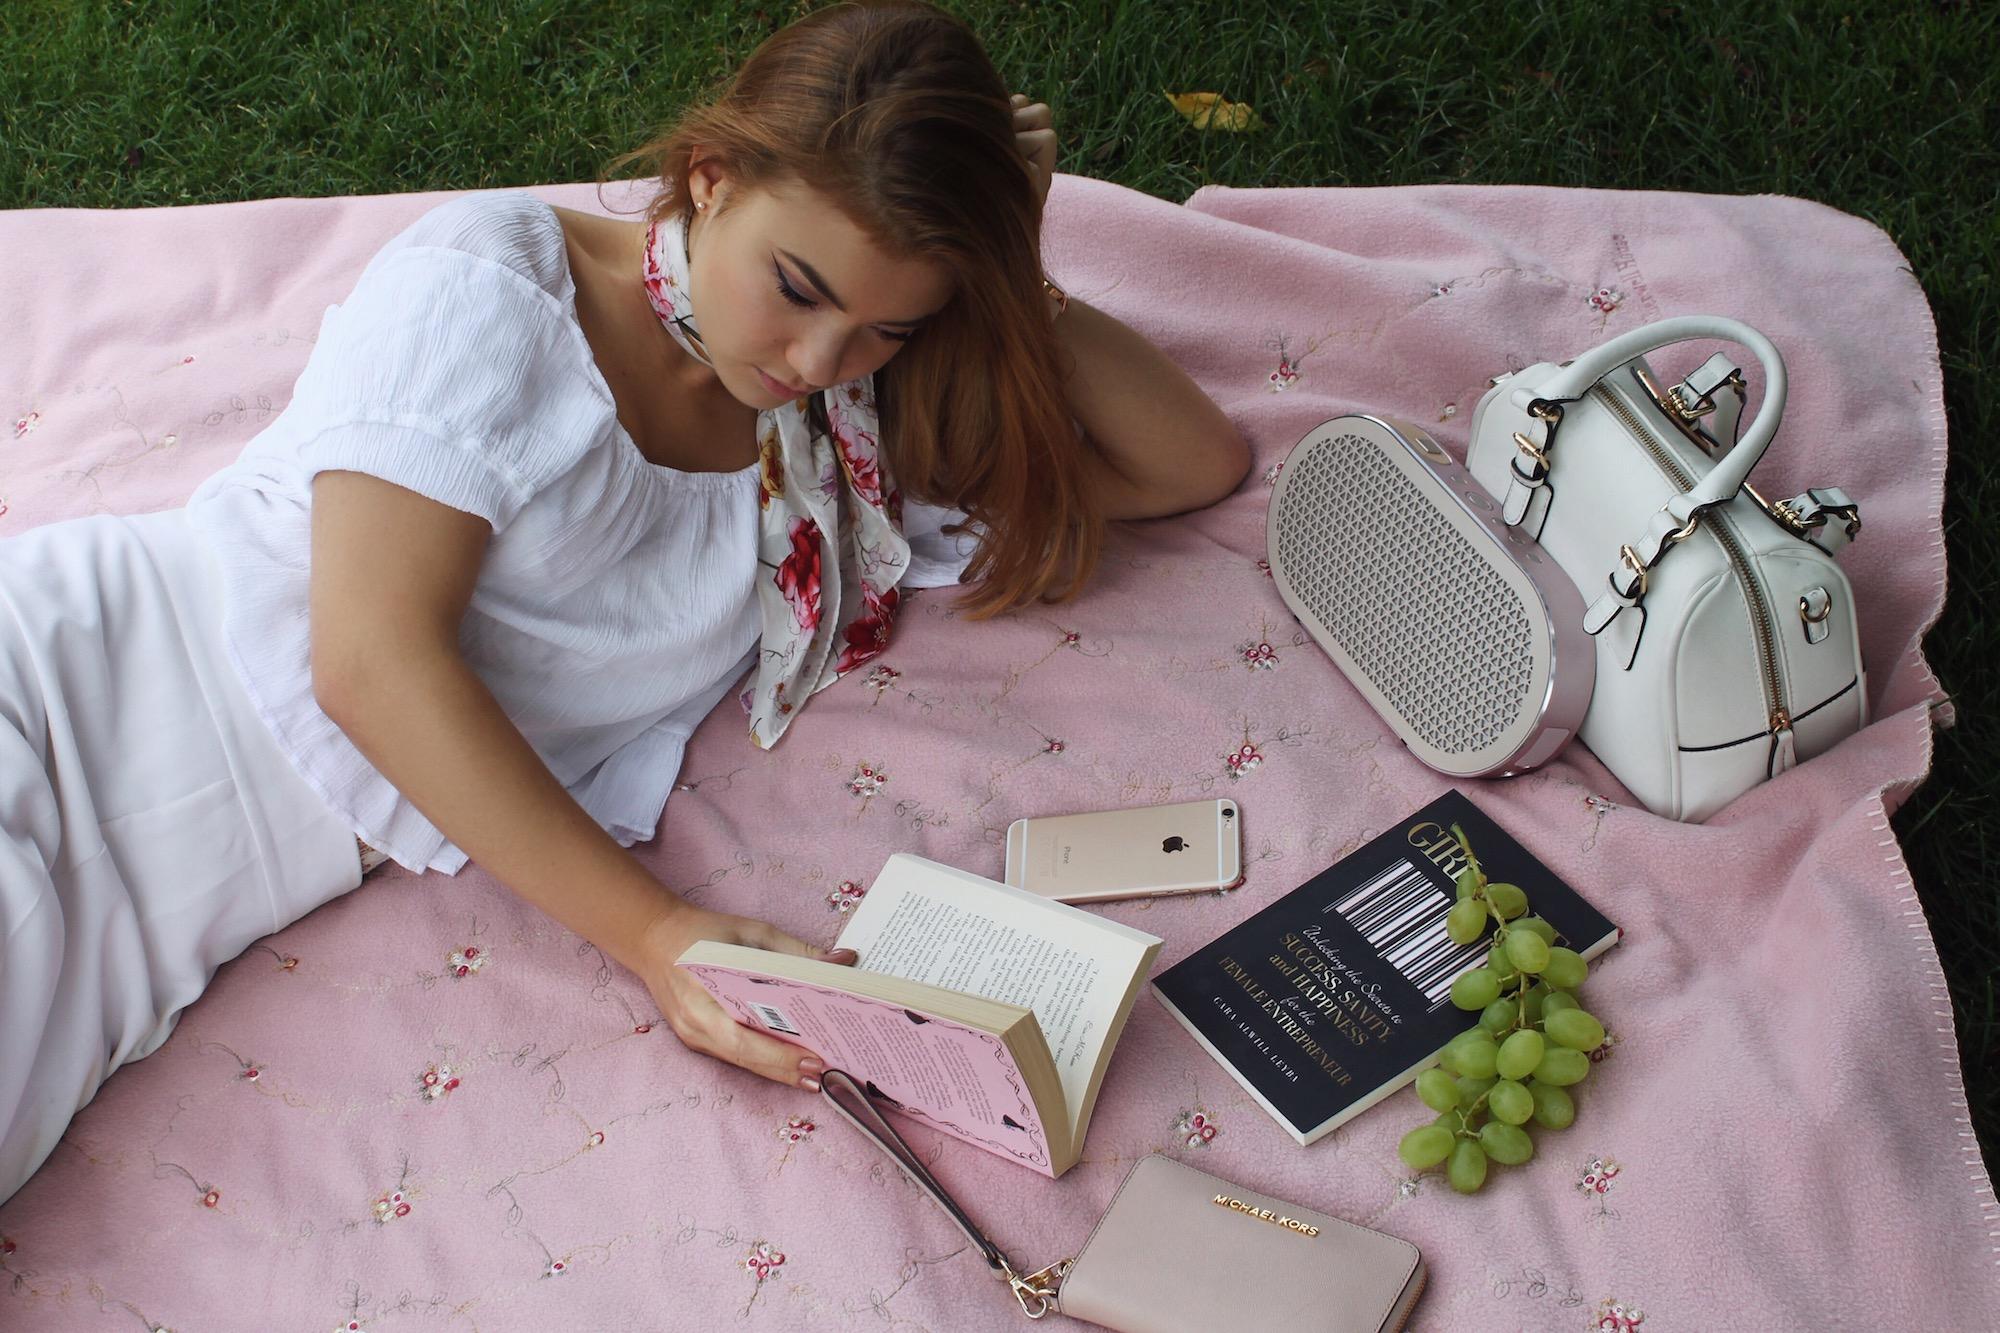 juliana-chow-dali-speakers-play-katch-campaign-instagram-social-technology-fashion-copenhagen-london-blog-blogger7